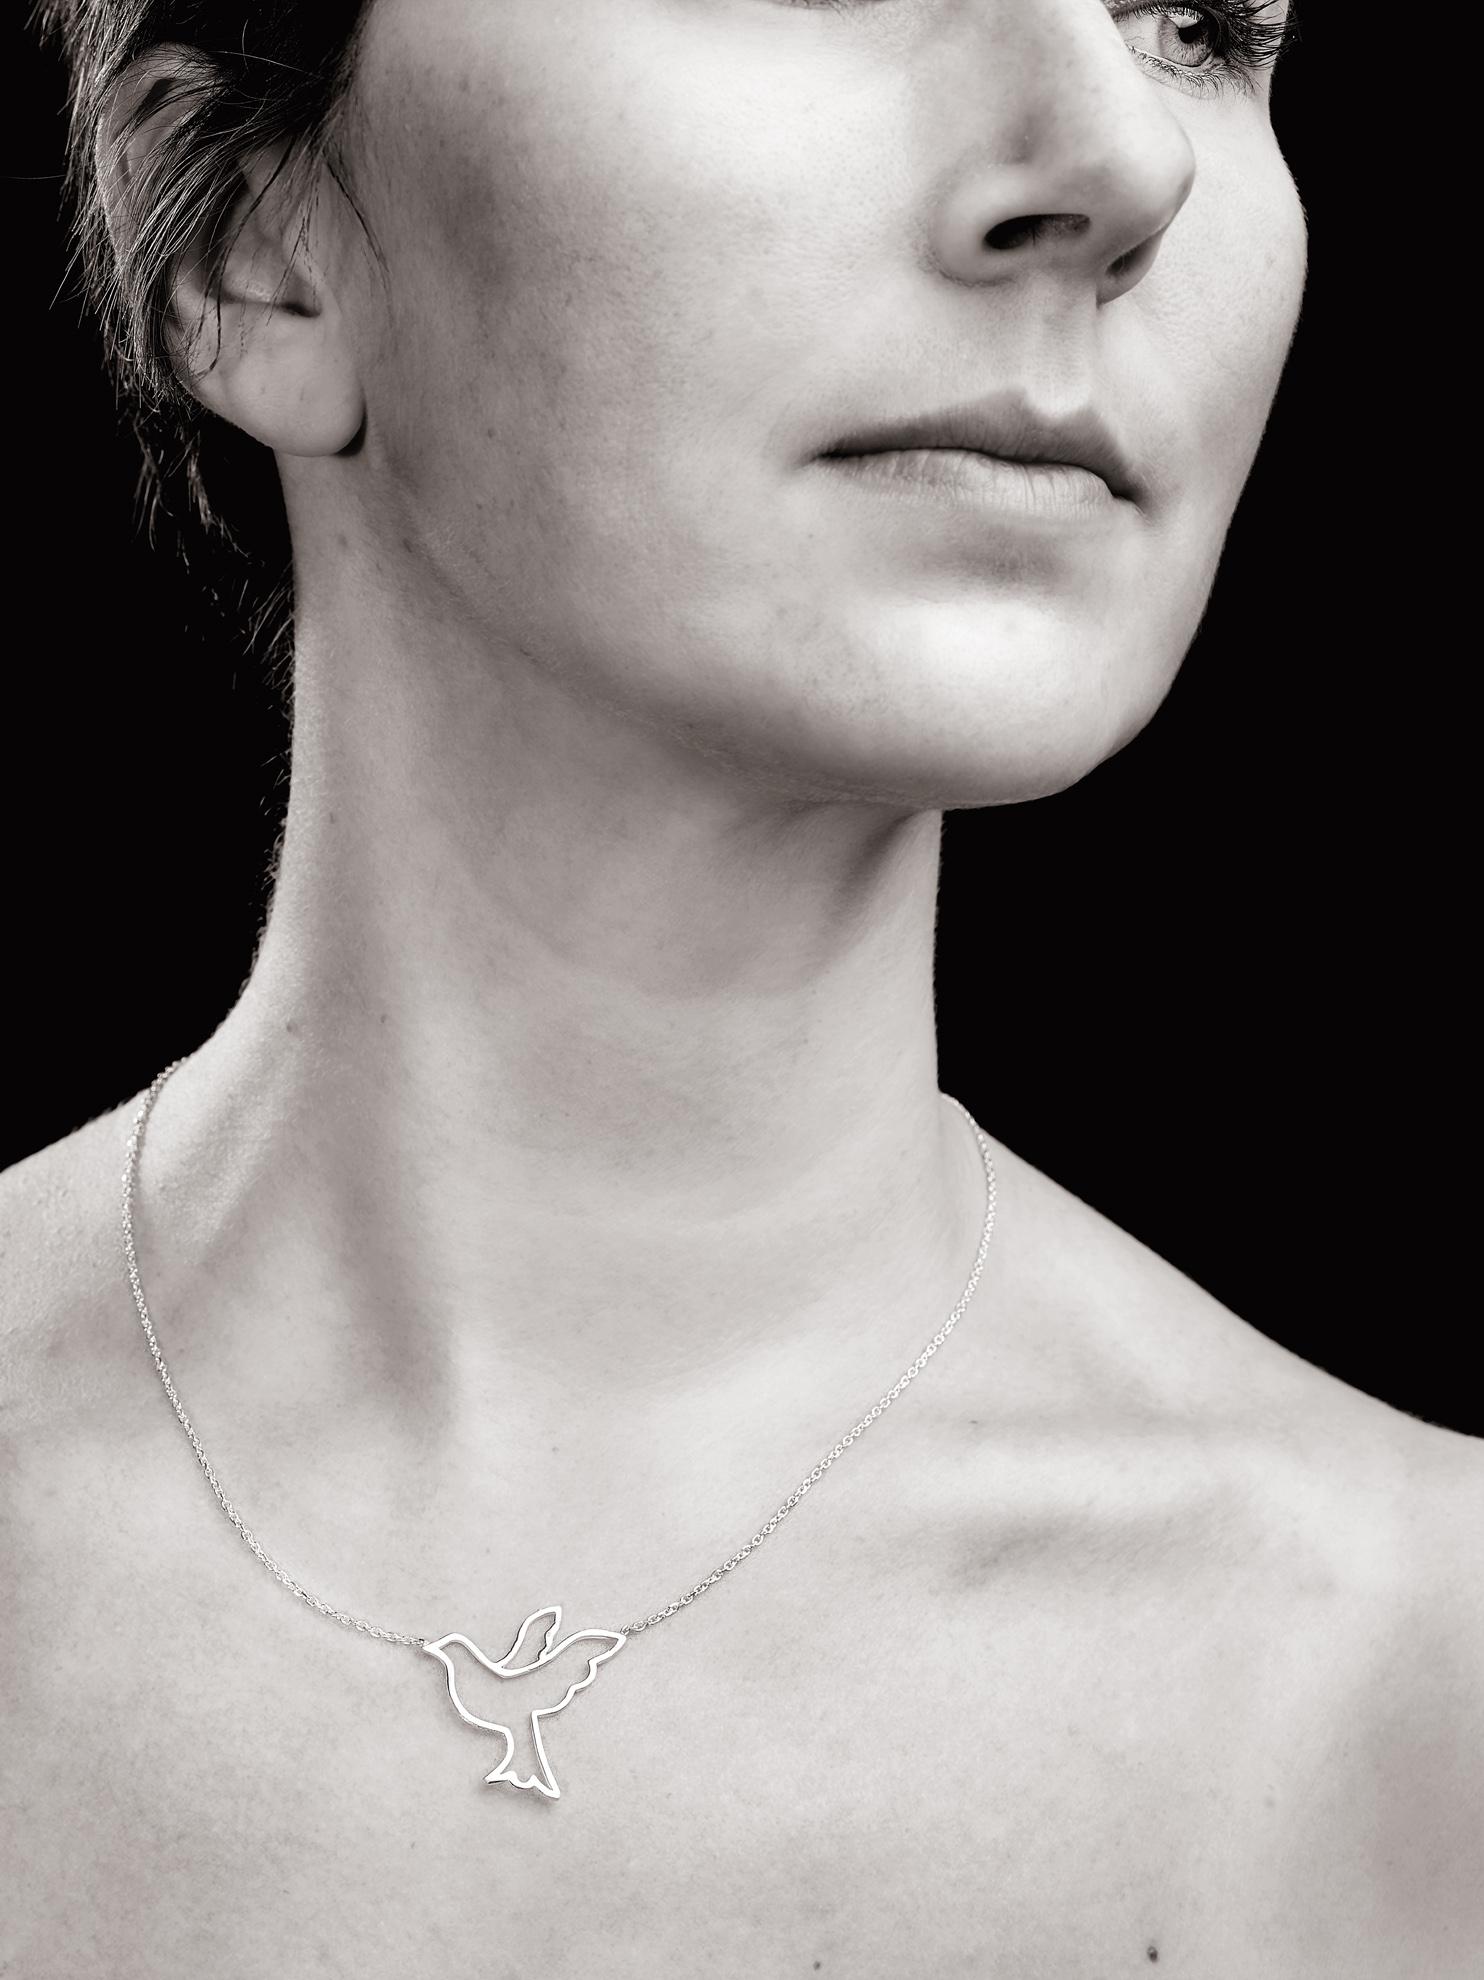 Studio photographe Alexandre Laurent